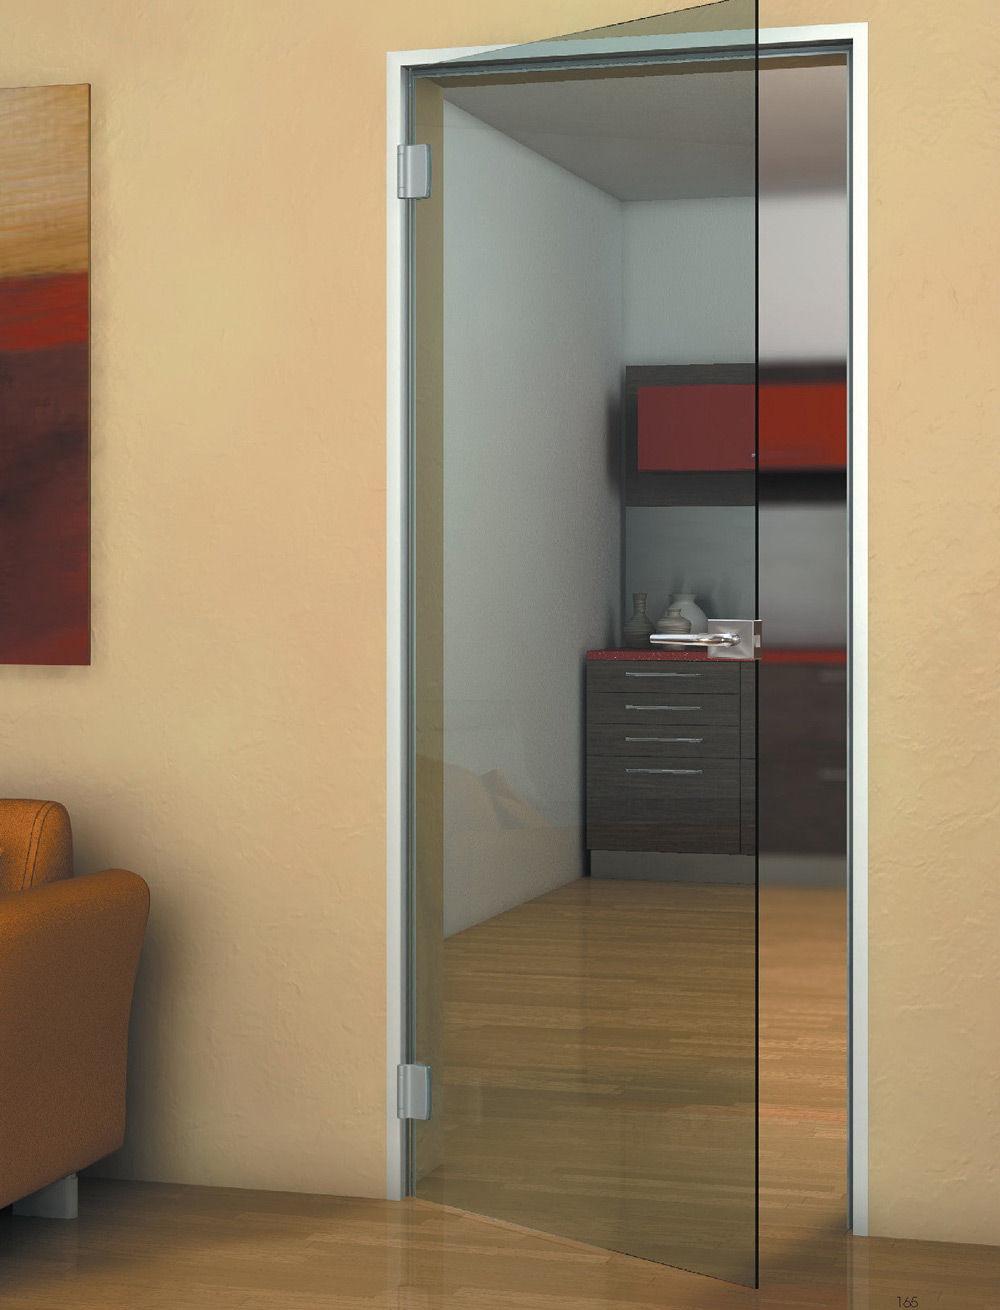 Дверь салонного типа